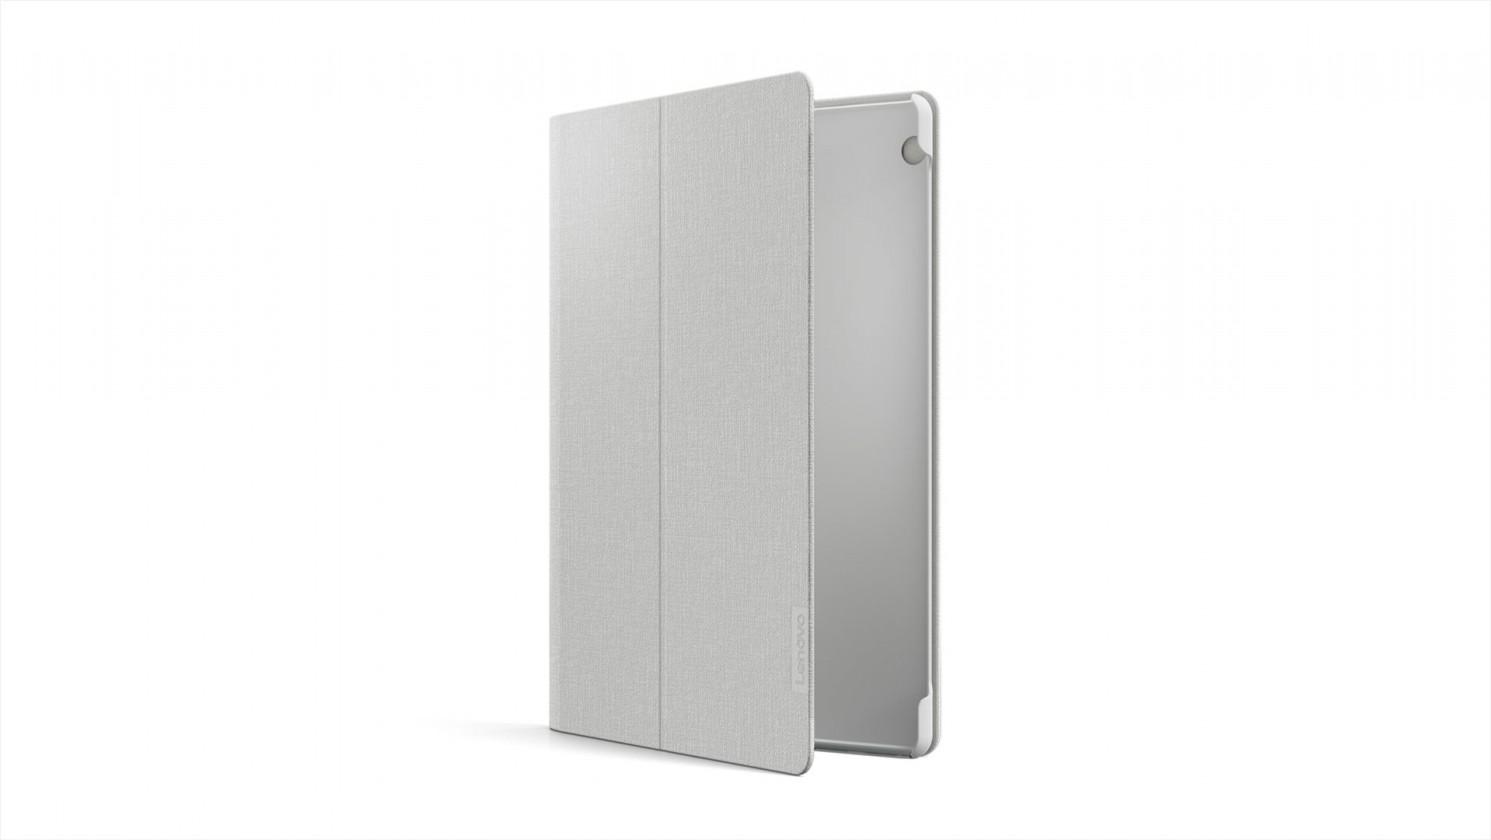 LENOVO Pouzdro Lenovo ZG38C02601 pro Tab M10, bílé